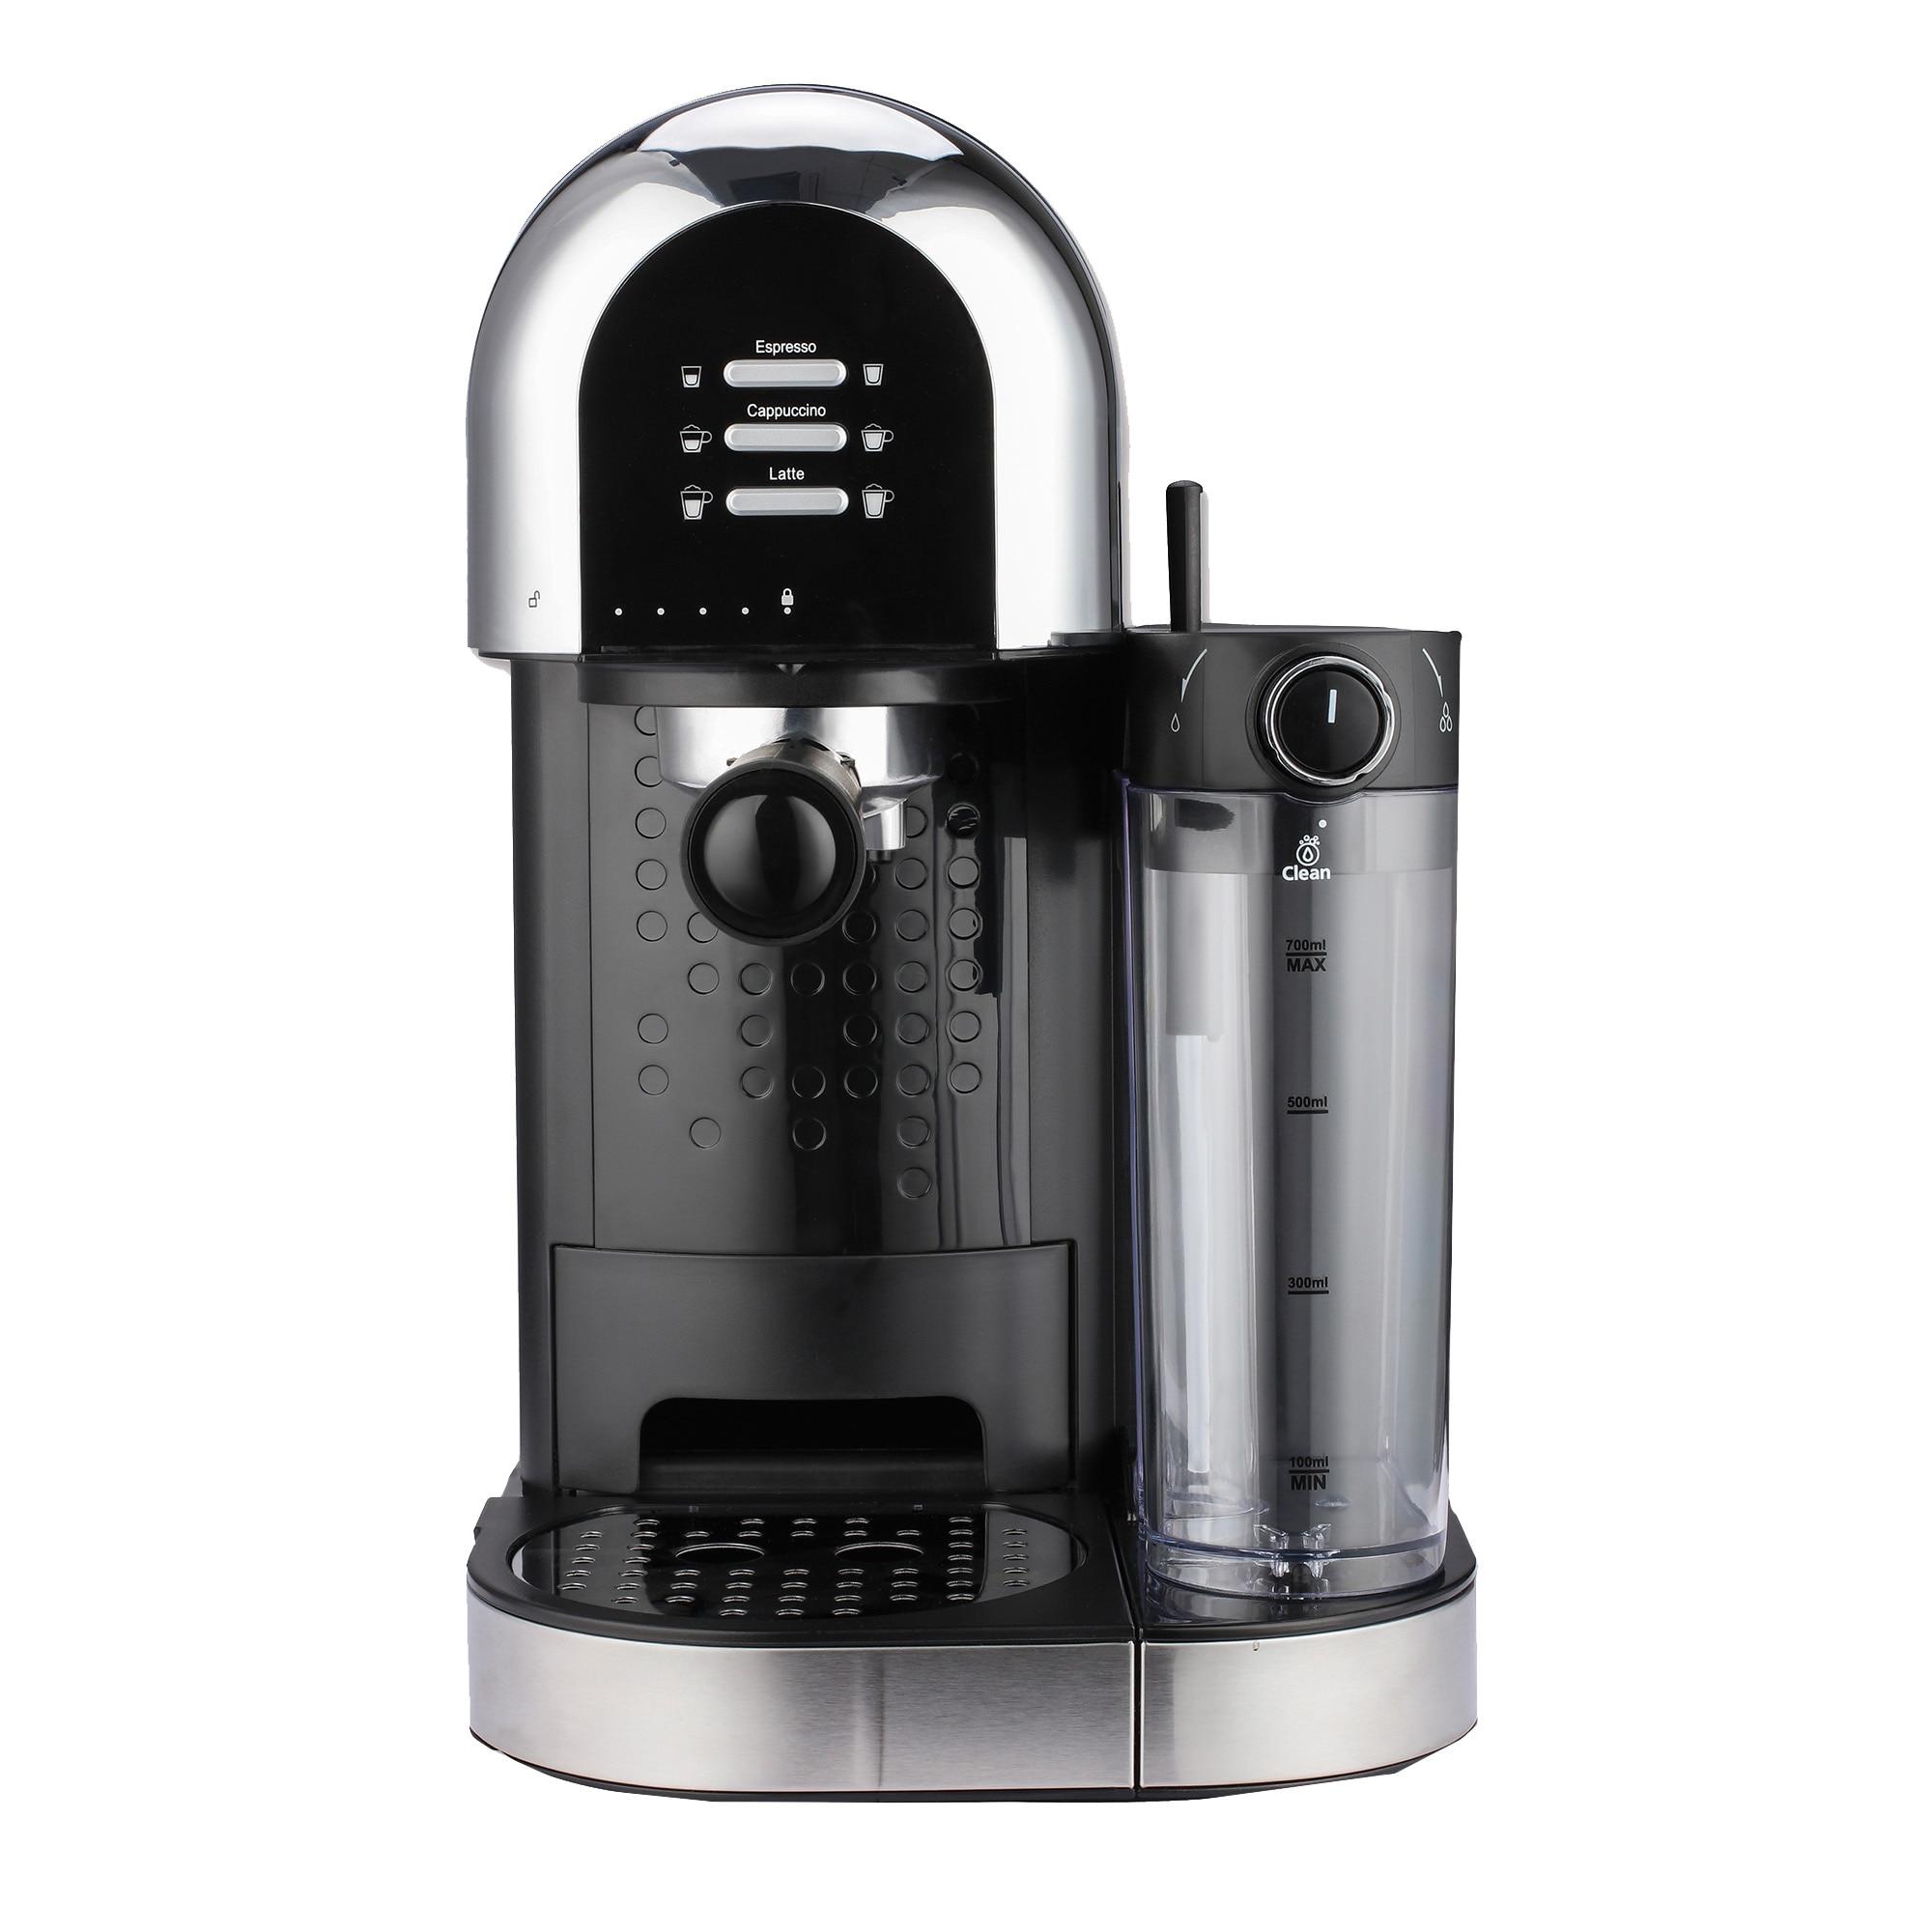 Fotografie Espressor manual Heinner Coffee Dreamer HEM-DL1470BK, 1230-1470W, 20bar, , dispozitiv spumare lapte, rezervor detasabil lapte 500ml, rezervor apa 1.7L, 6 tipuri de bauturi, Negru